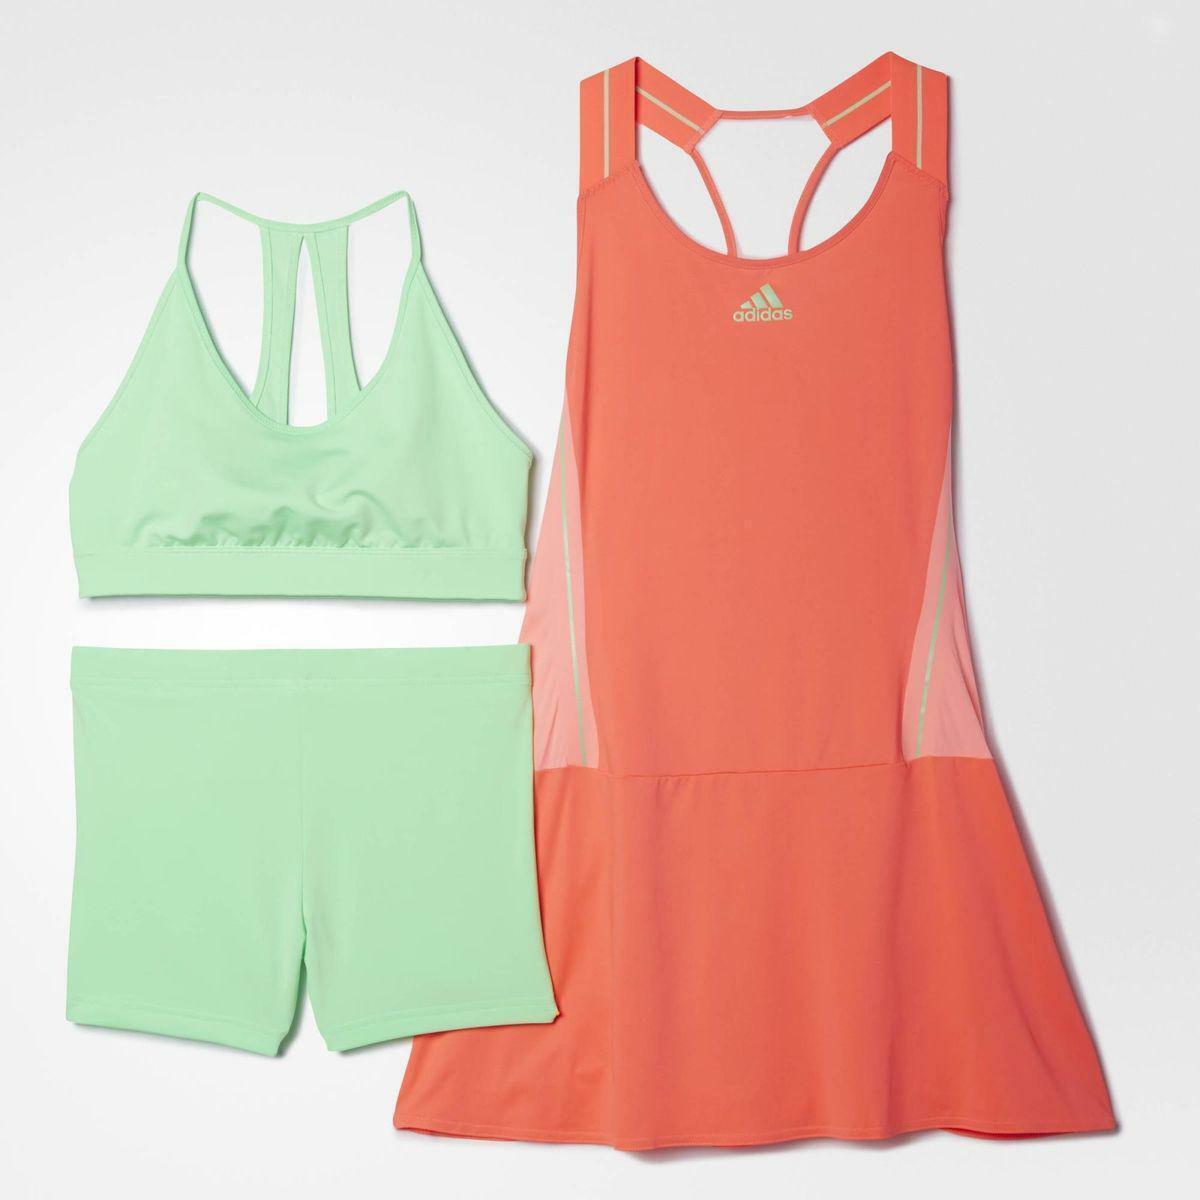 Adidas Women's Pro Player WTA Adizero Tennis Dress Red   Green S09308 Size